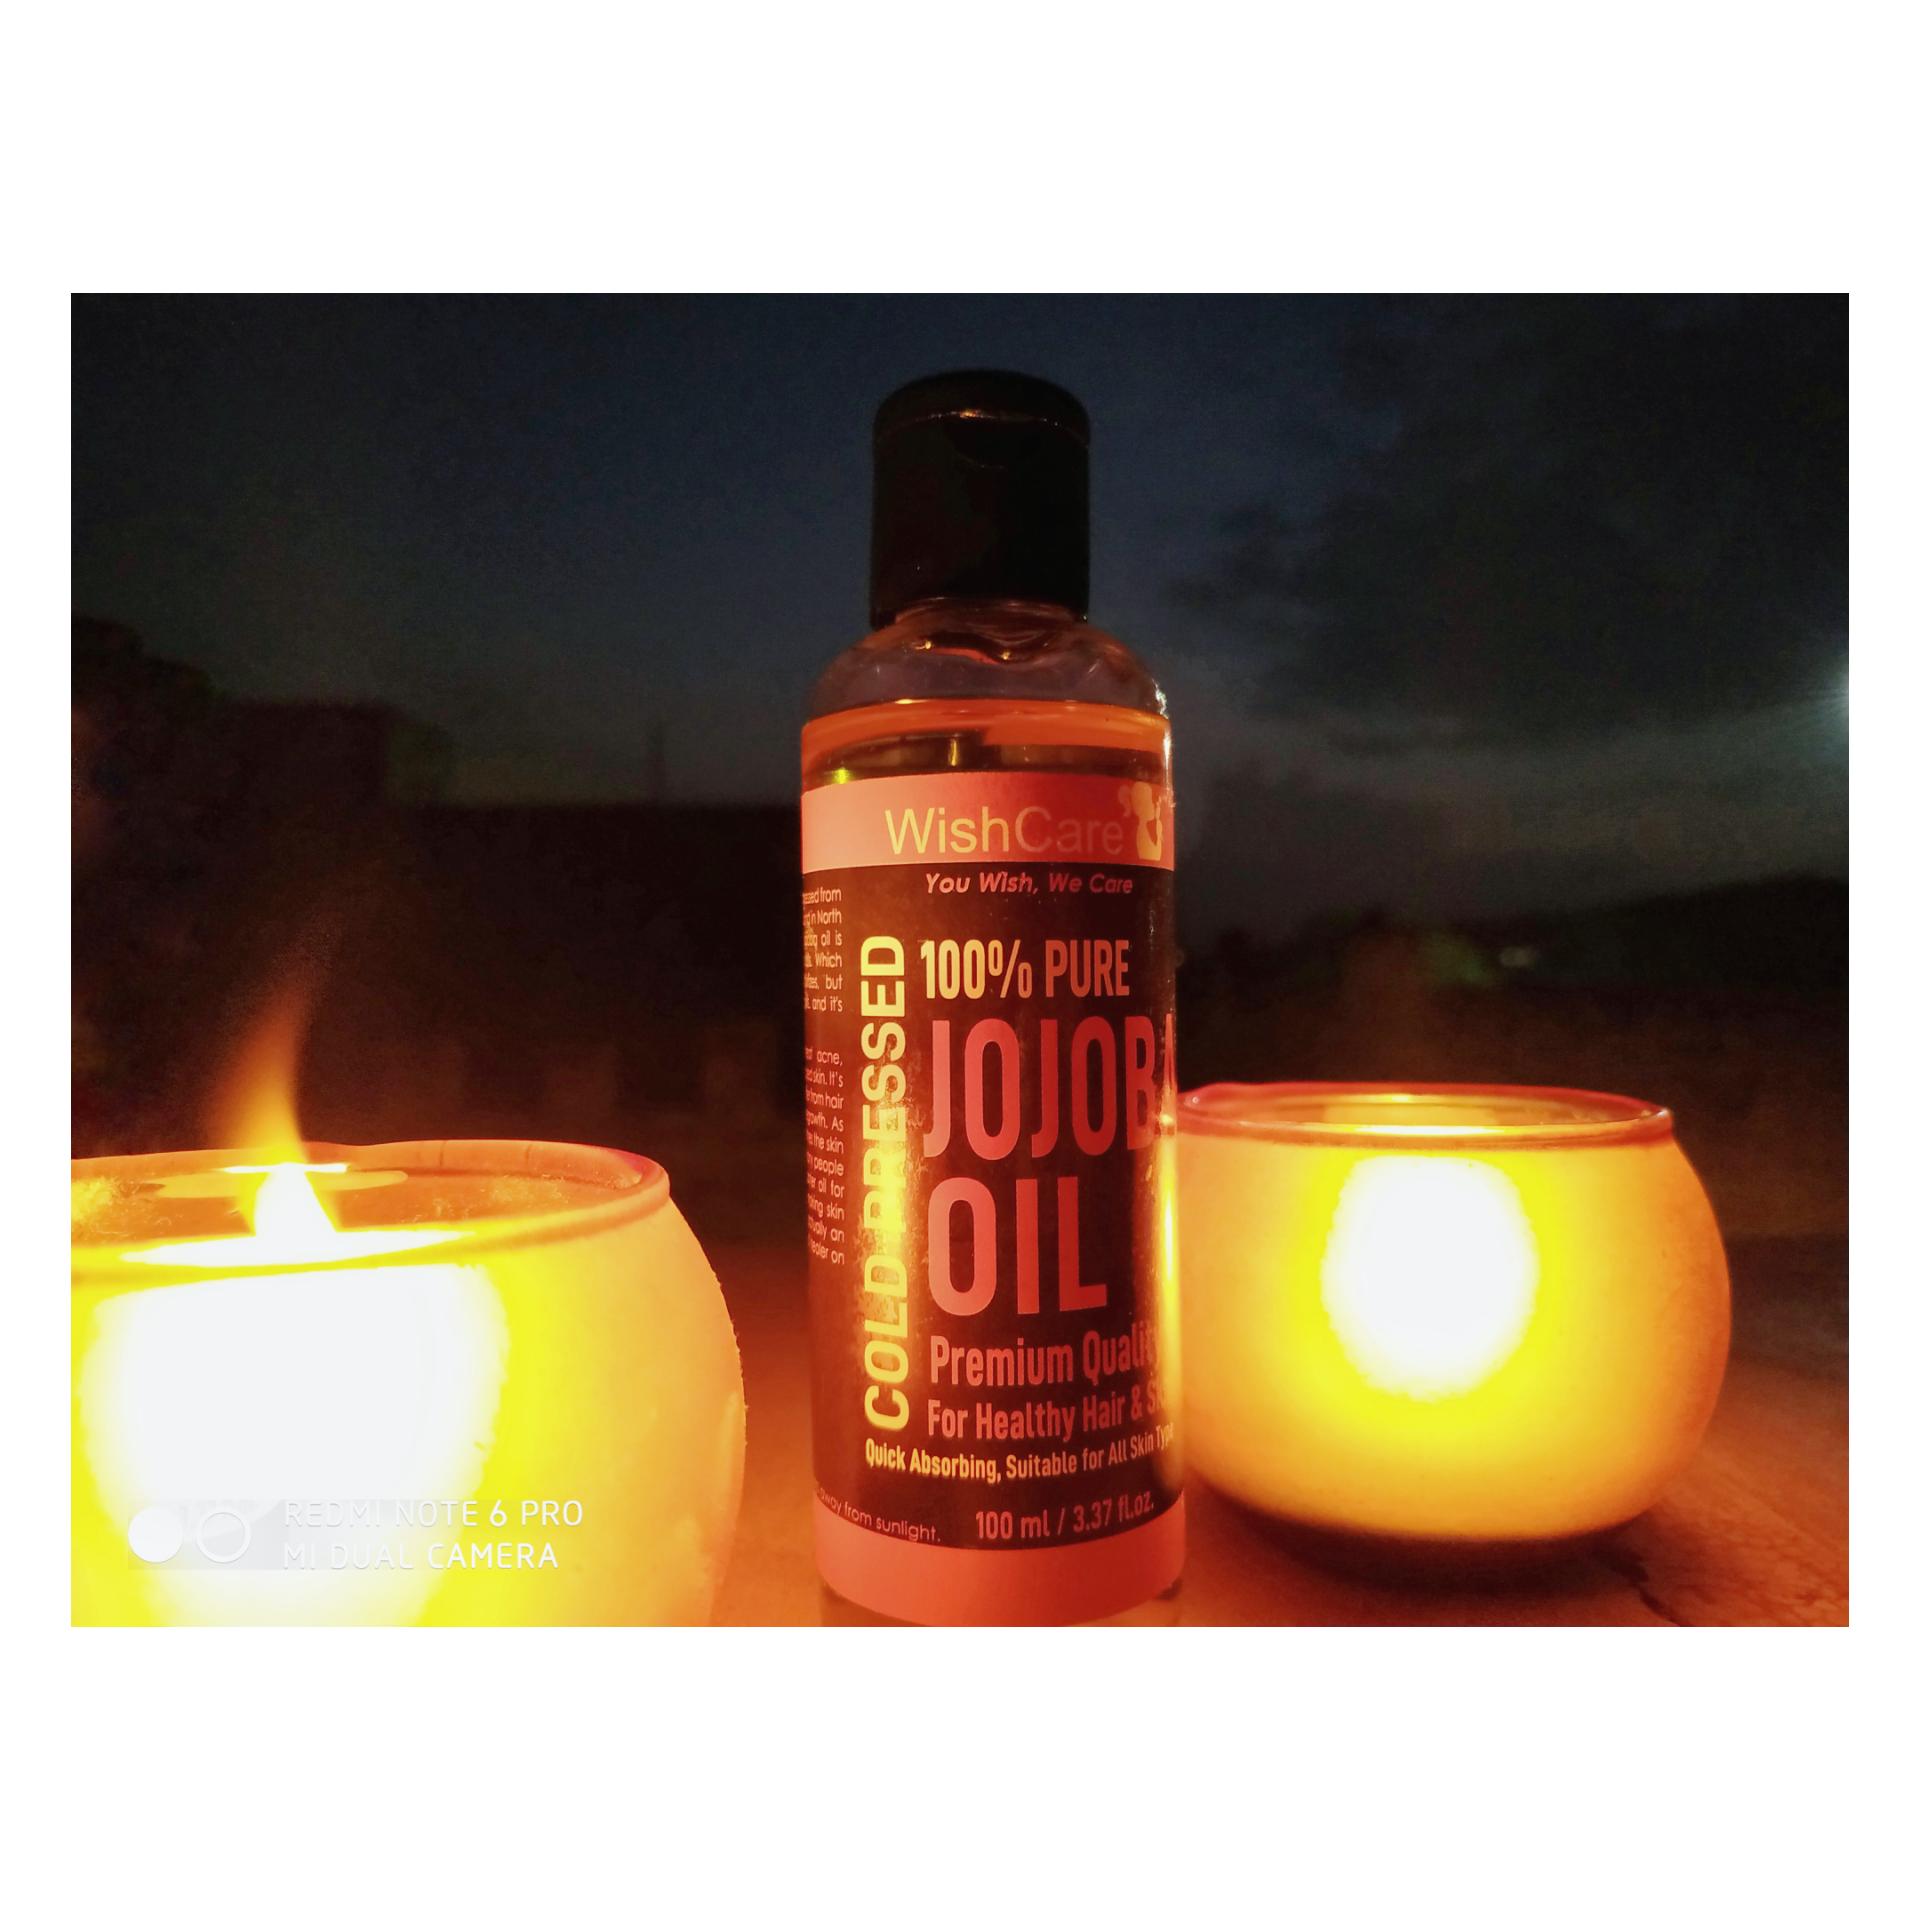 WishCare Pure Cold Pressed Jojoba Oil-All purpose moisturization-By taniyajoshi13